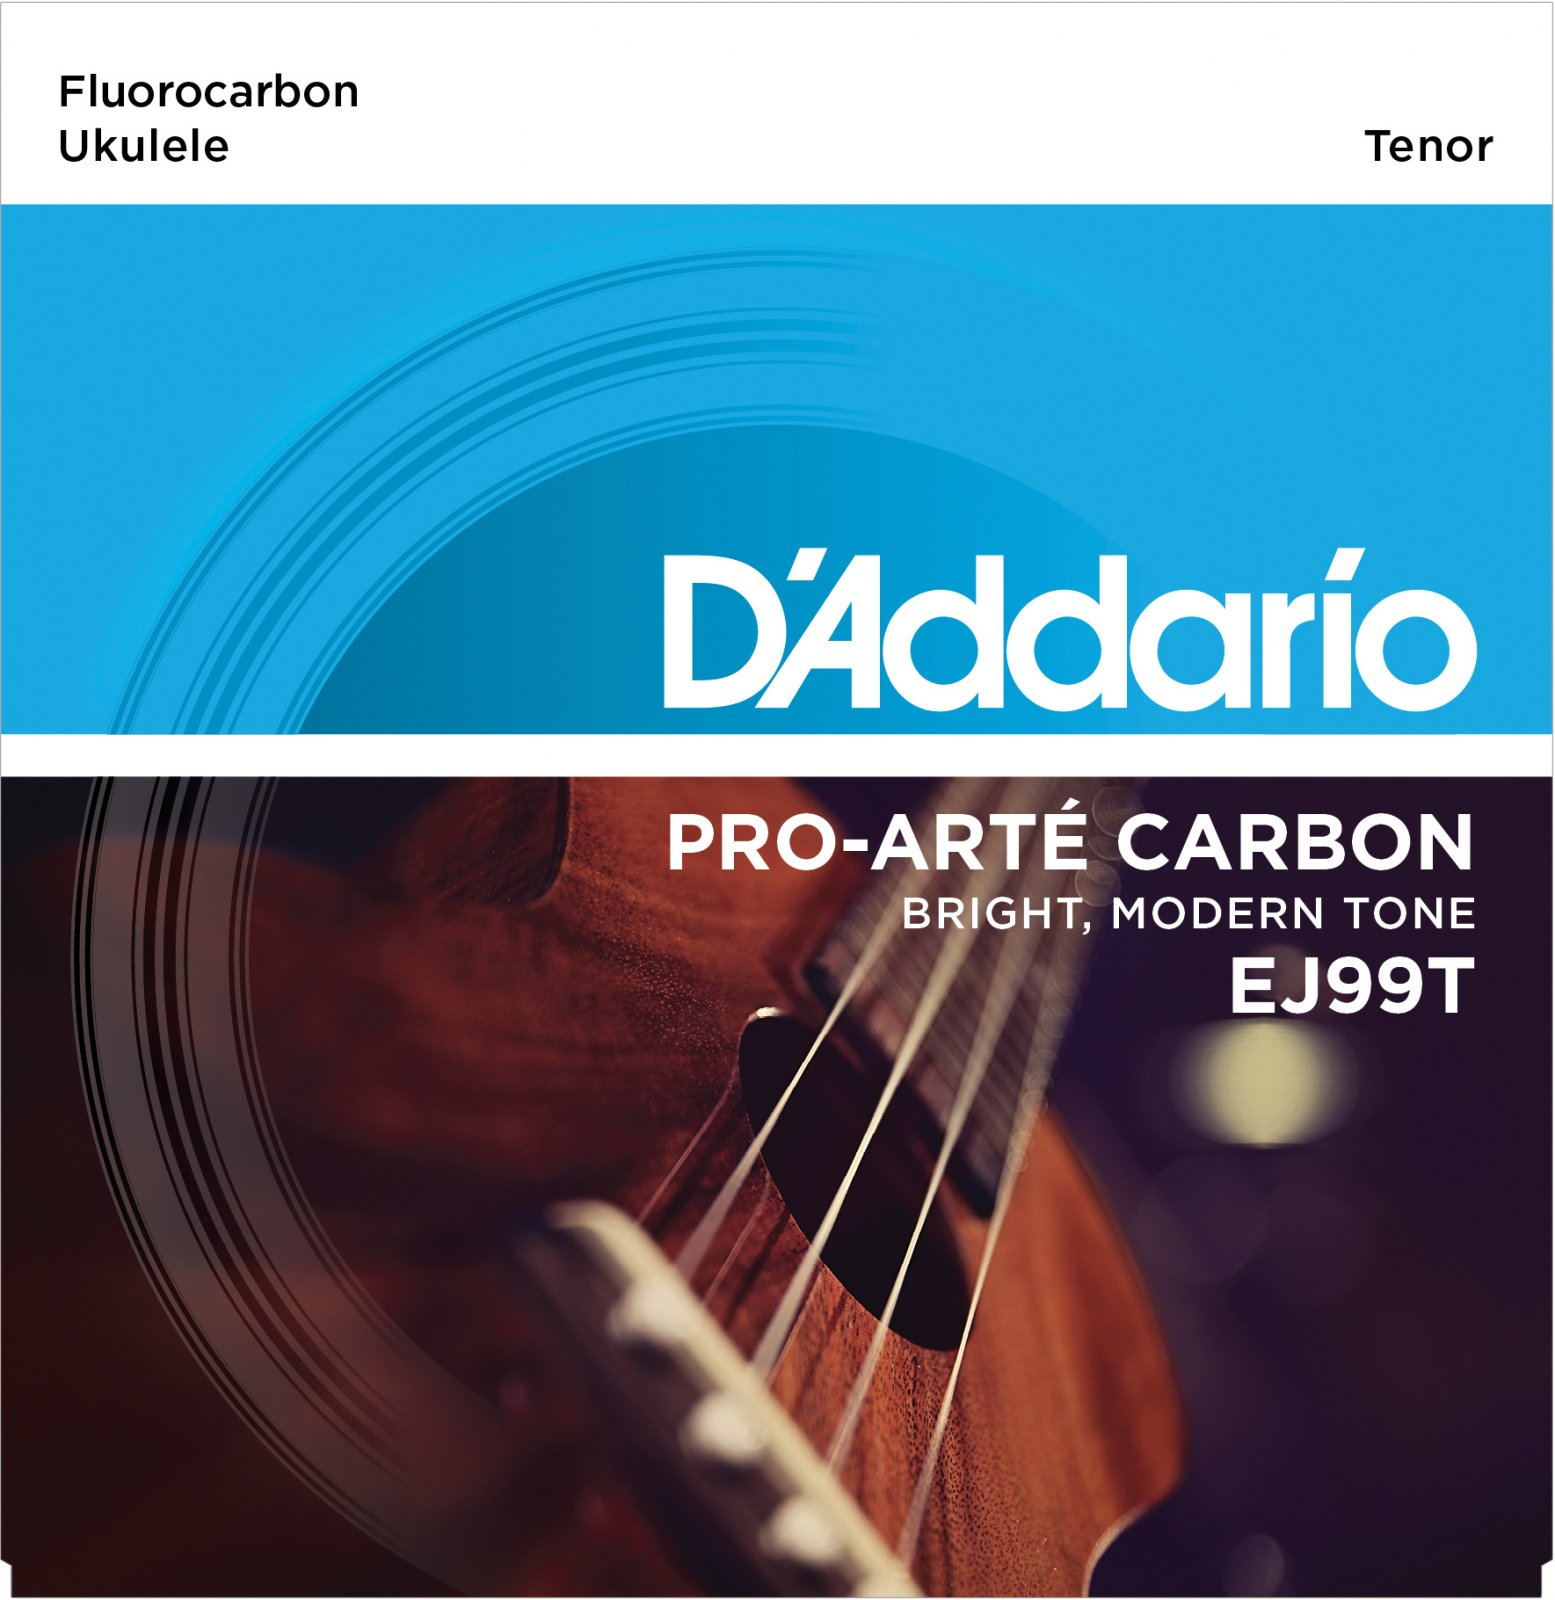 D'Addario Fluorocarbon Tenor Ukulele Strings